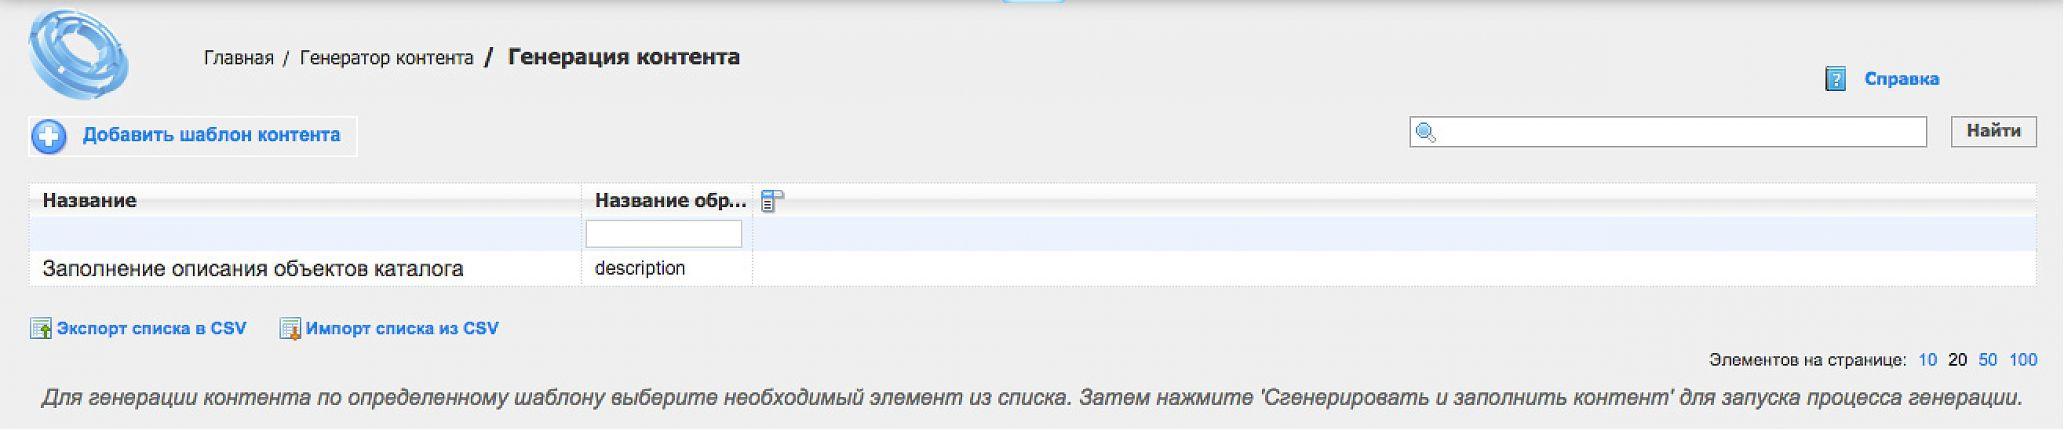 modul_generacii_kontenta_dlya_umi_market